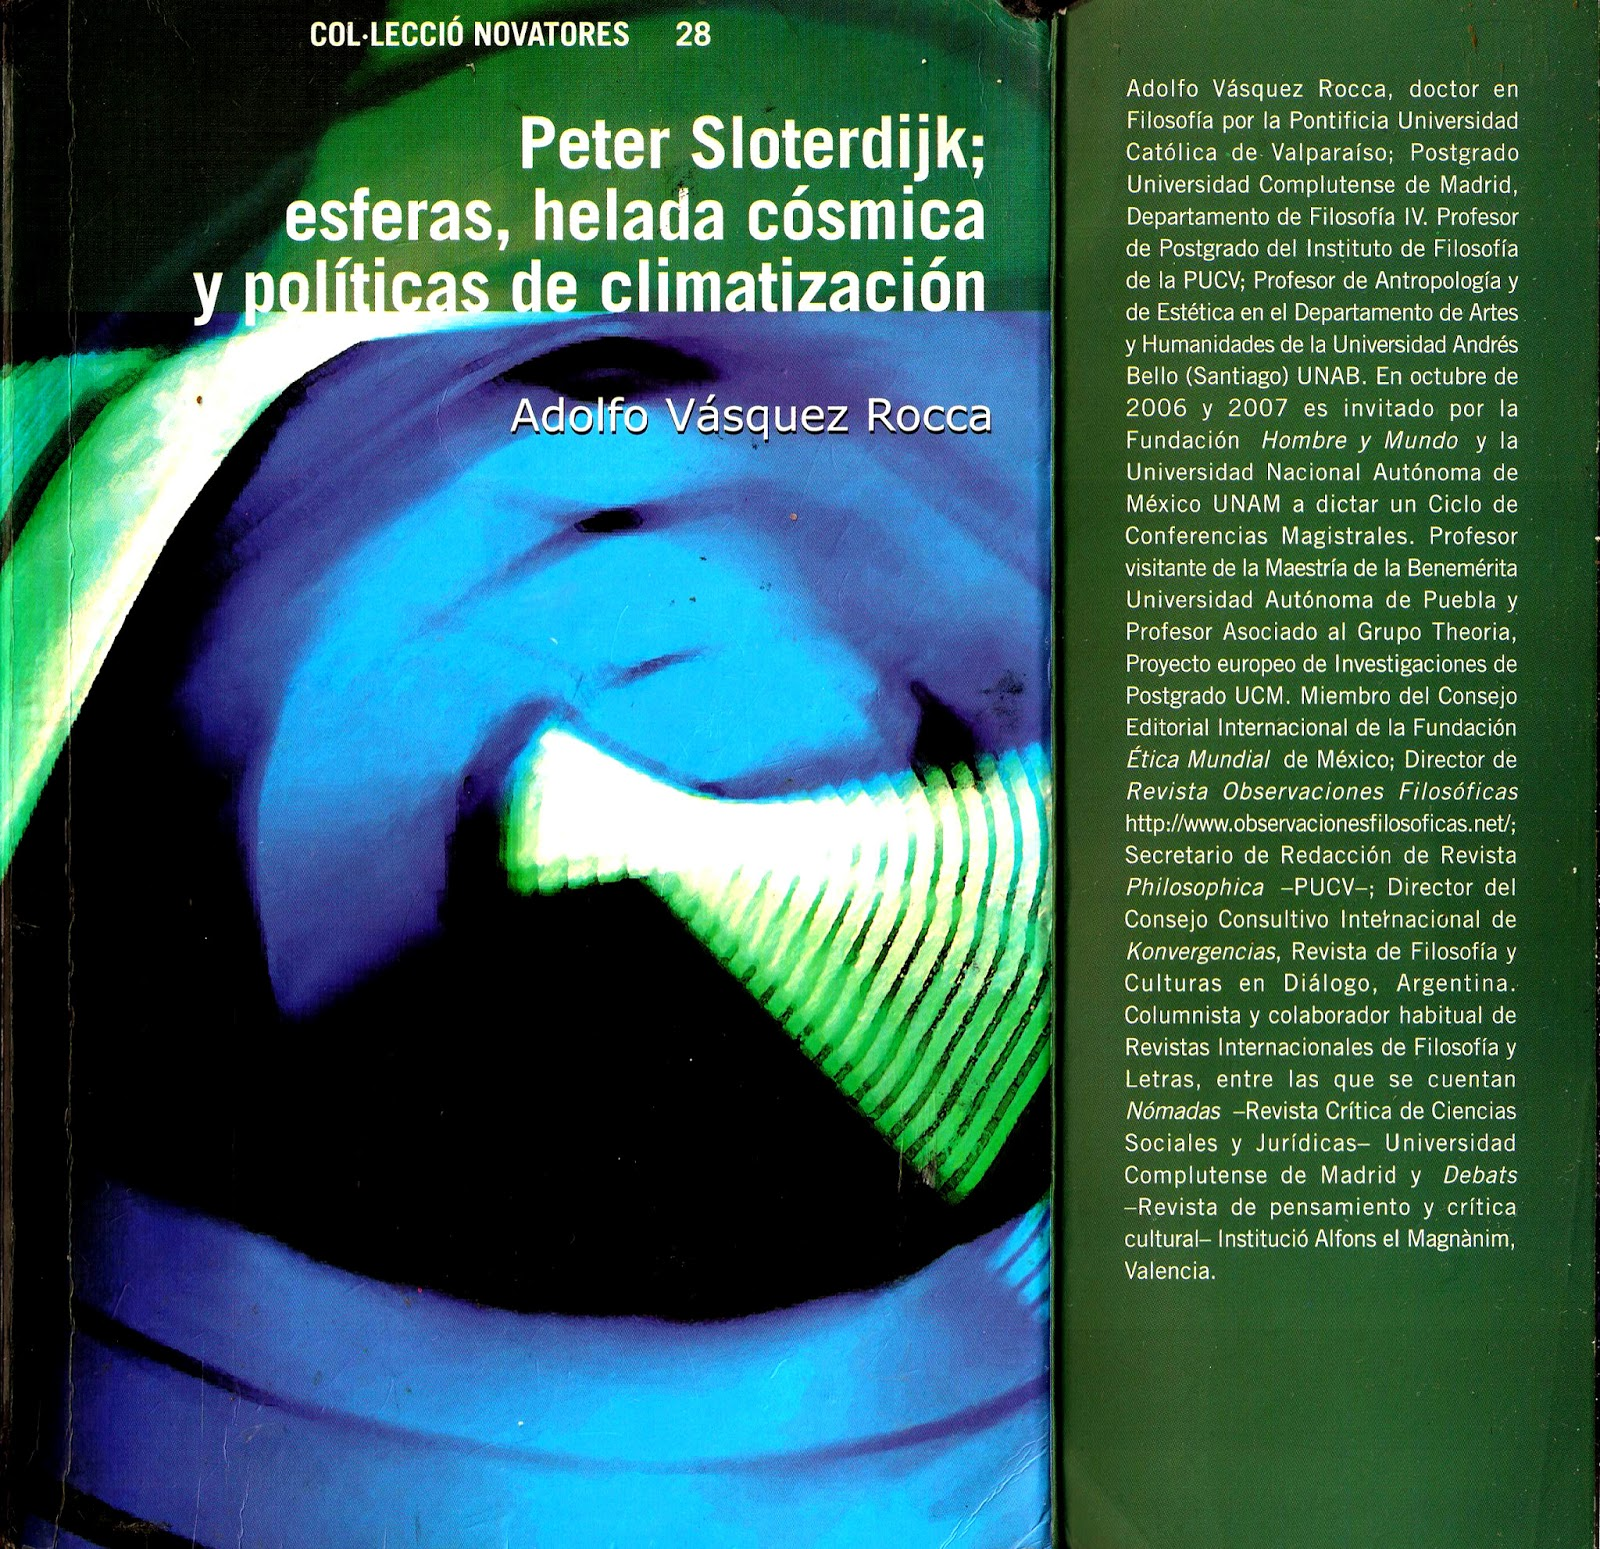 http://1.bp.blogspot.com/-9hbOGMLYIF4/UYmP8ZRoI4I/AAAAAAAAHbA/qTkulVqAhFM/s1600/Libro+Sloterdijk+2.png